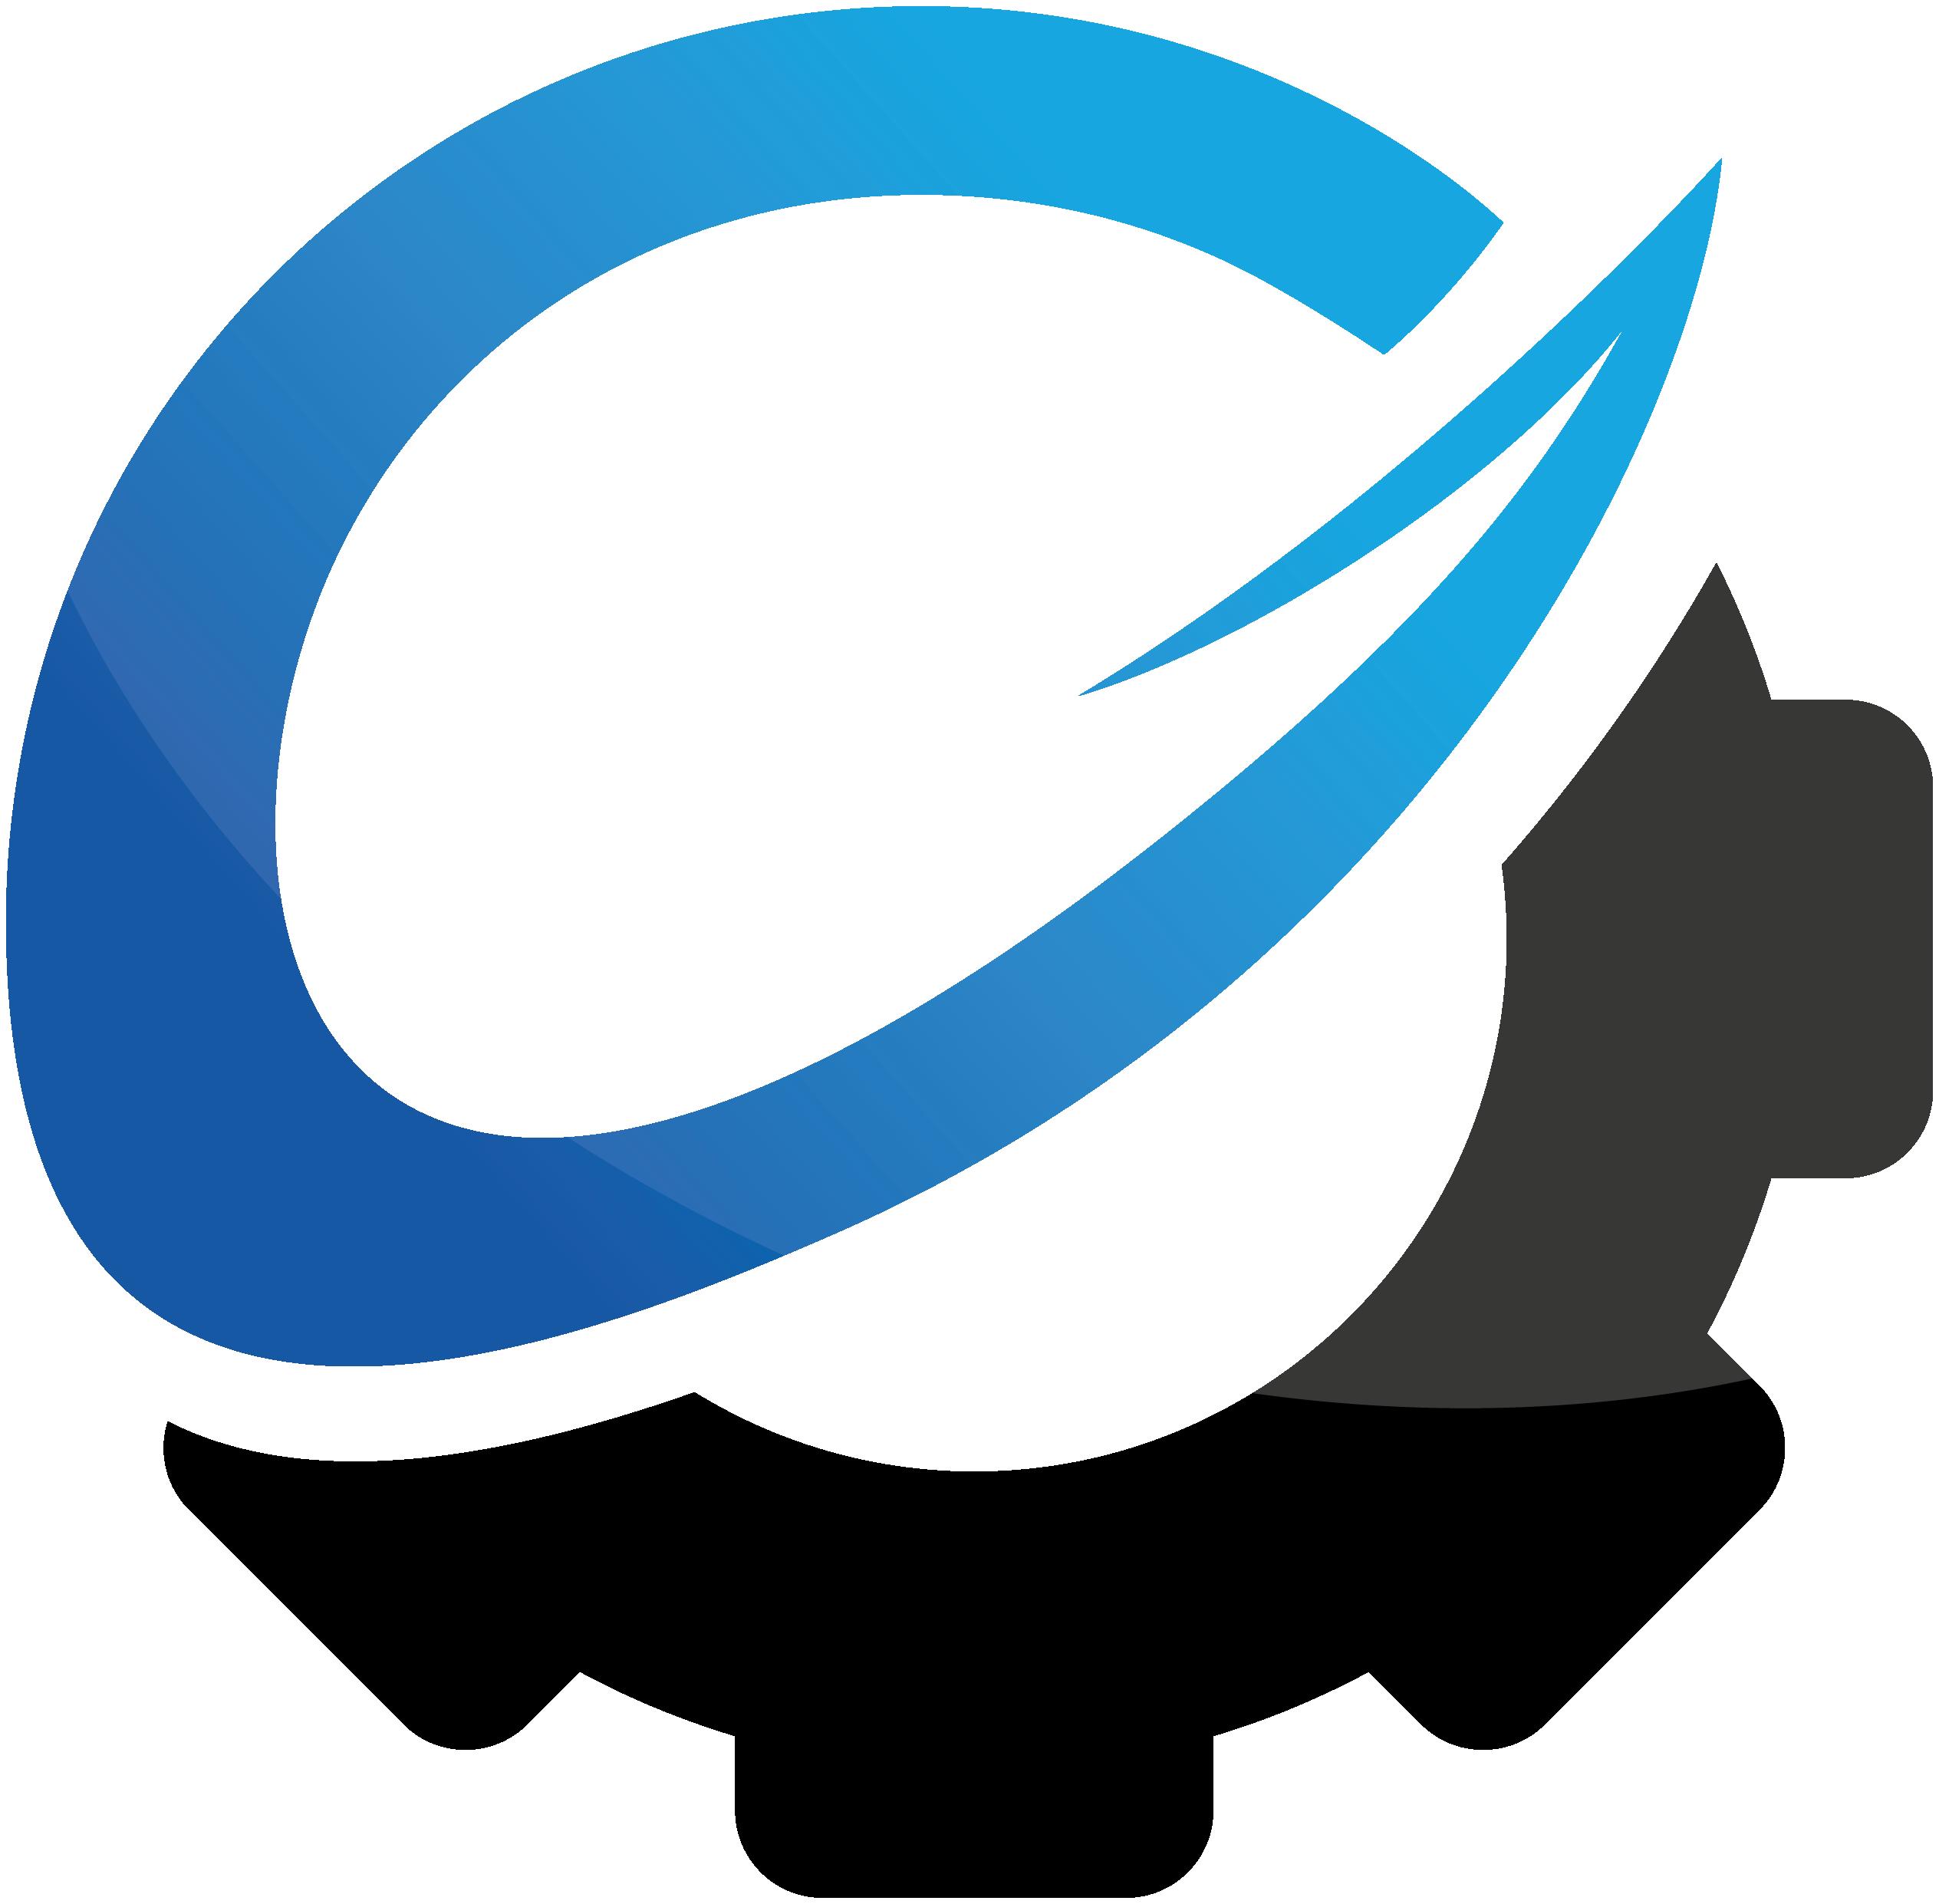 Symbole-logo-drioton-01.png